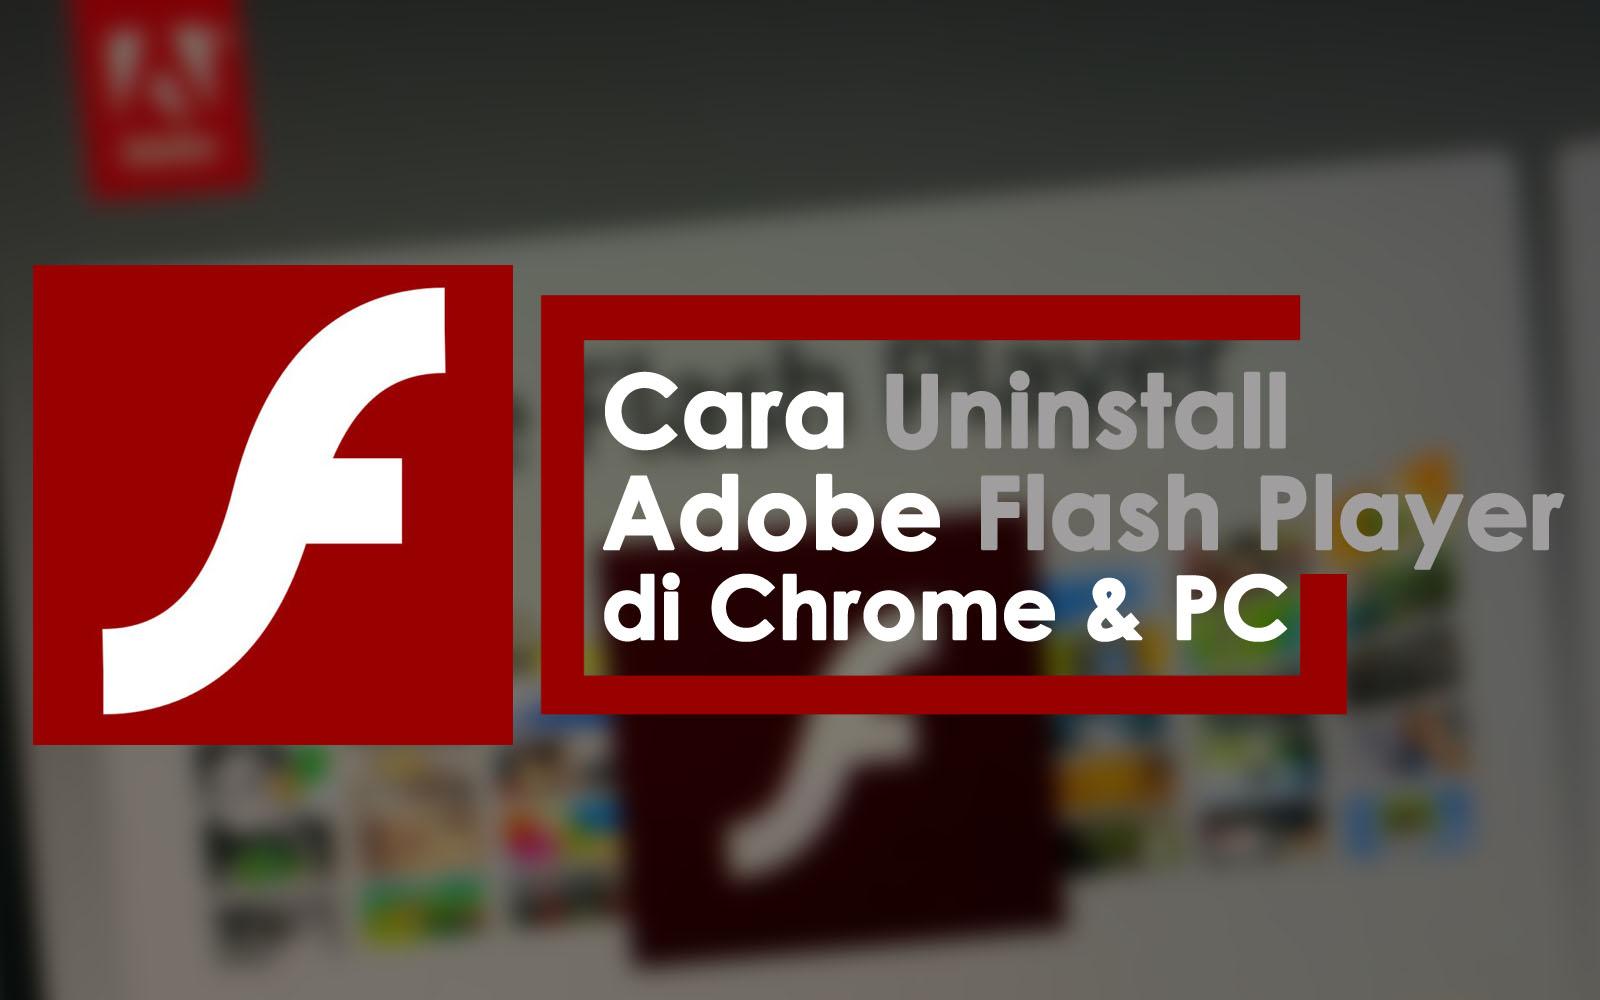 cara uninstall adobe flash player